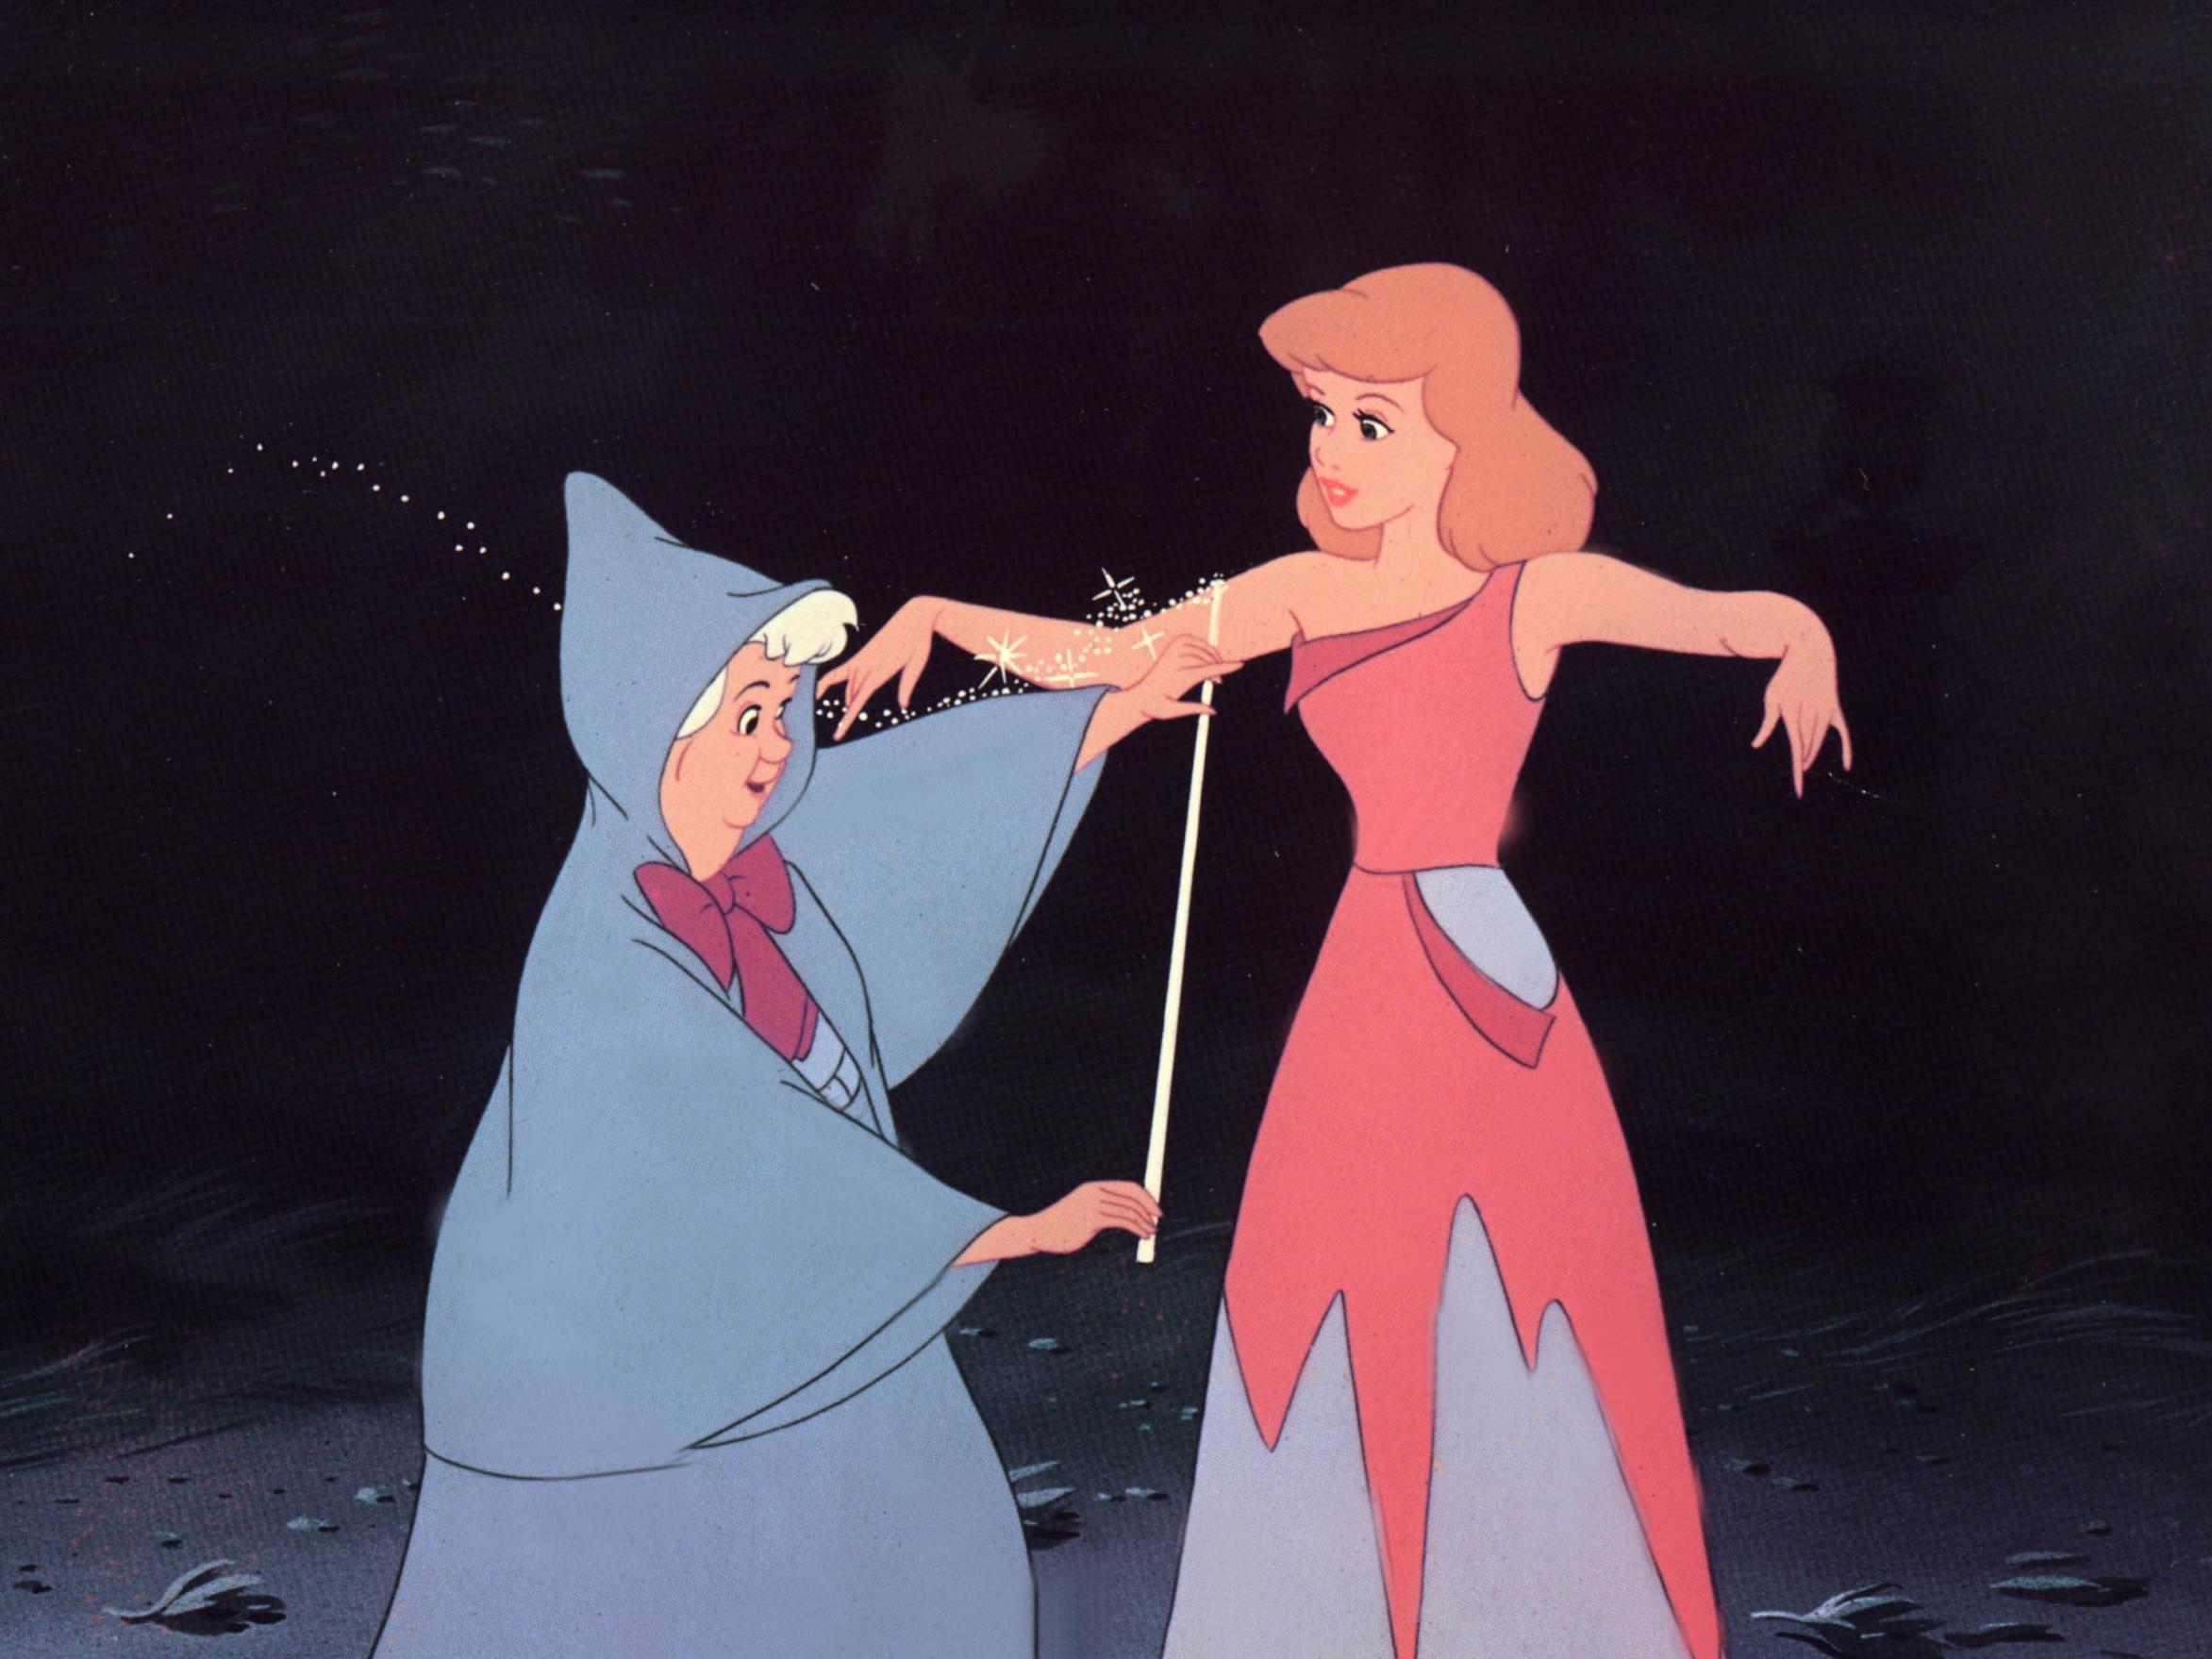 Little Mermaid: Original Ariel actor defends casting of Halle Bailey